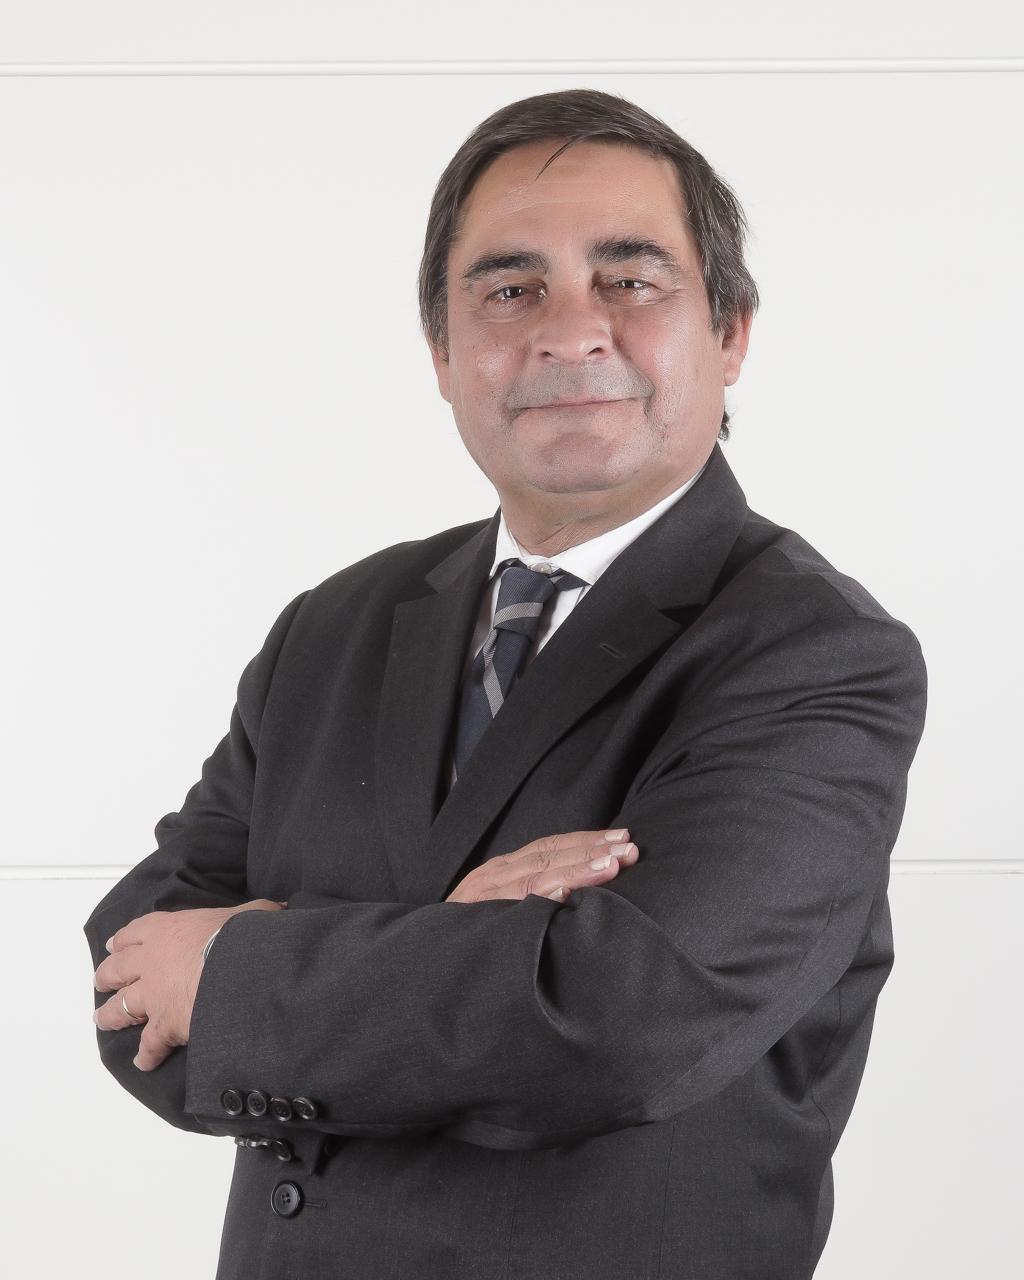 José Ferreira de Andrade